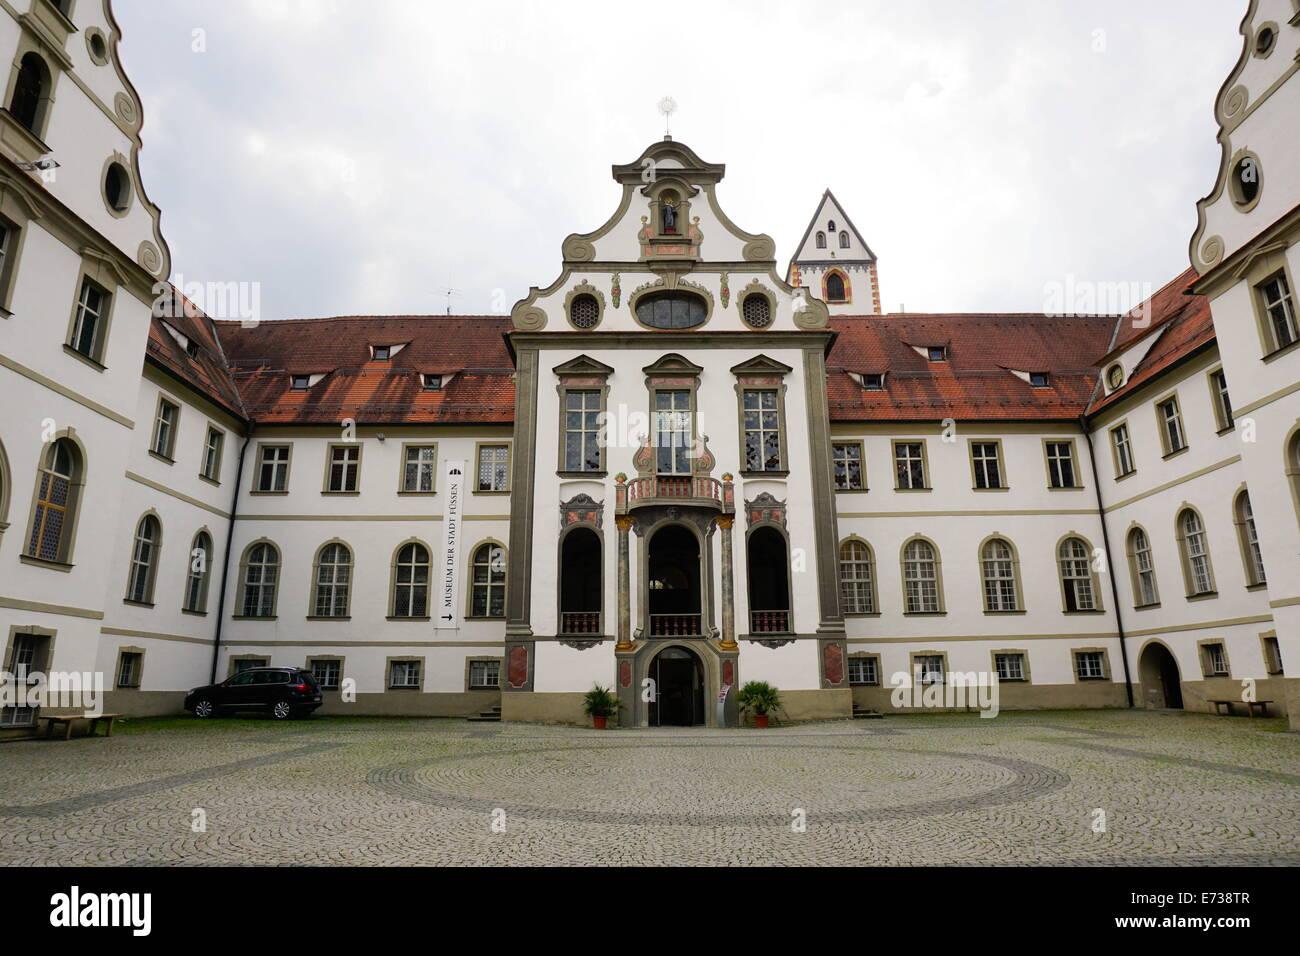 City Museum, Fussen, Bavaria, Germany, Europe - Stock Image